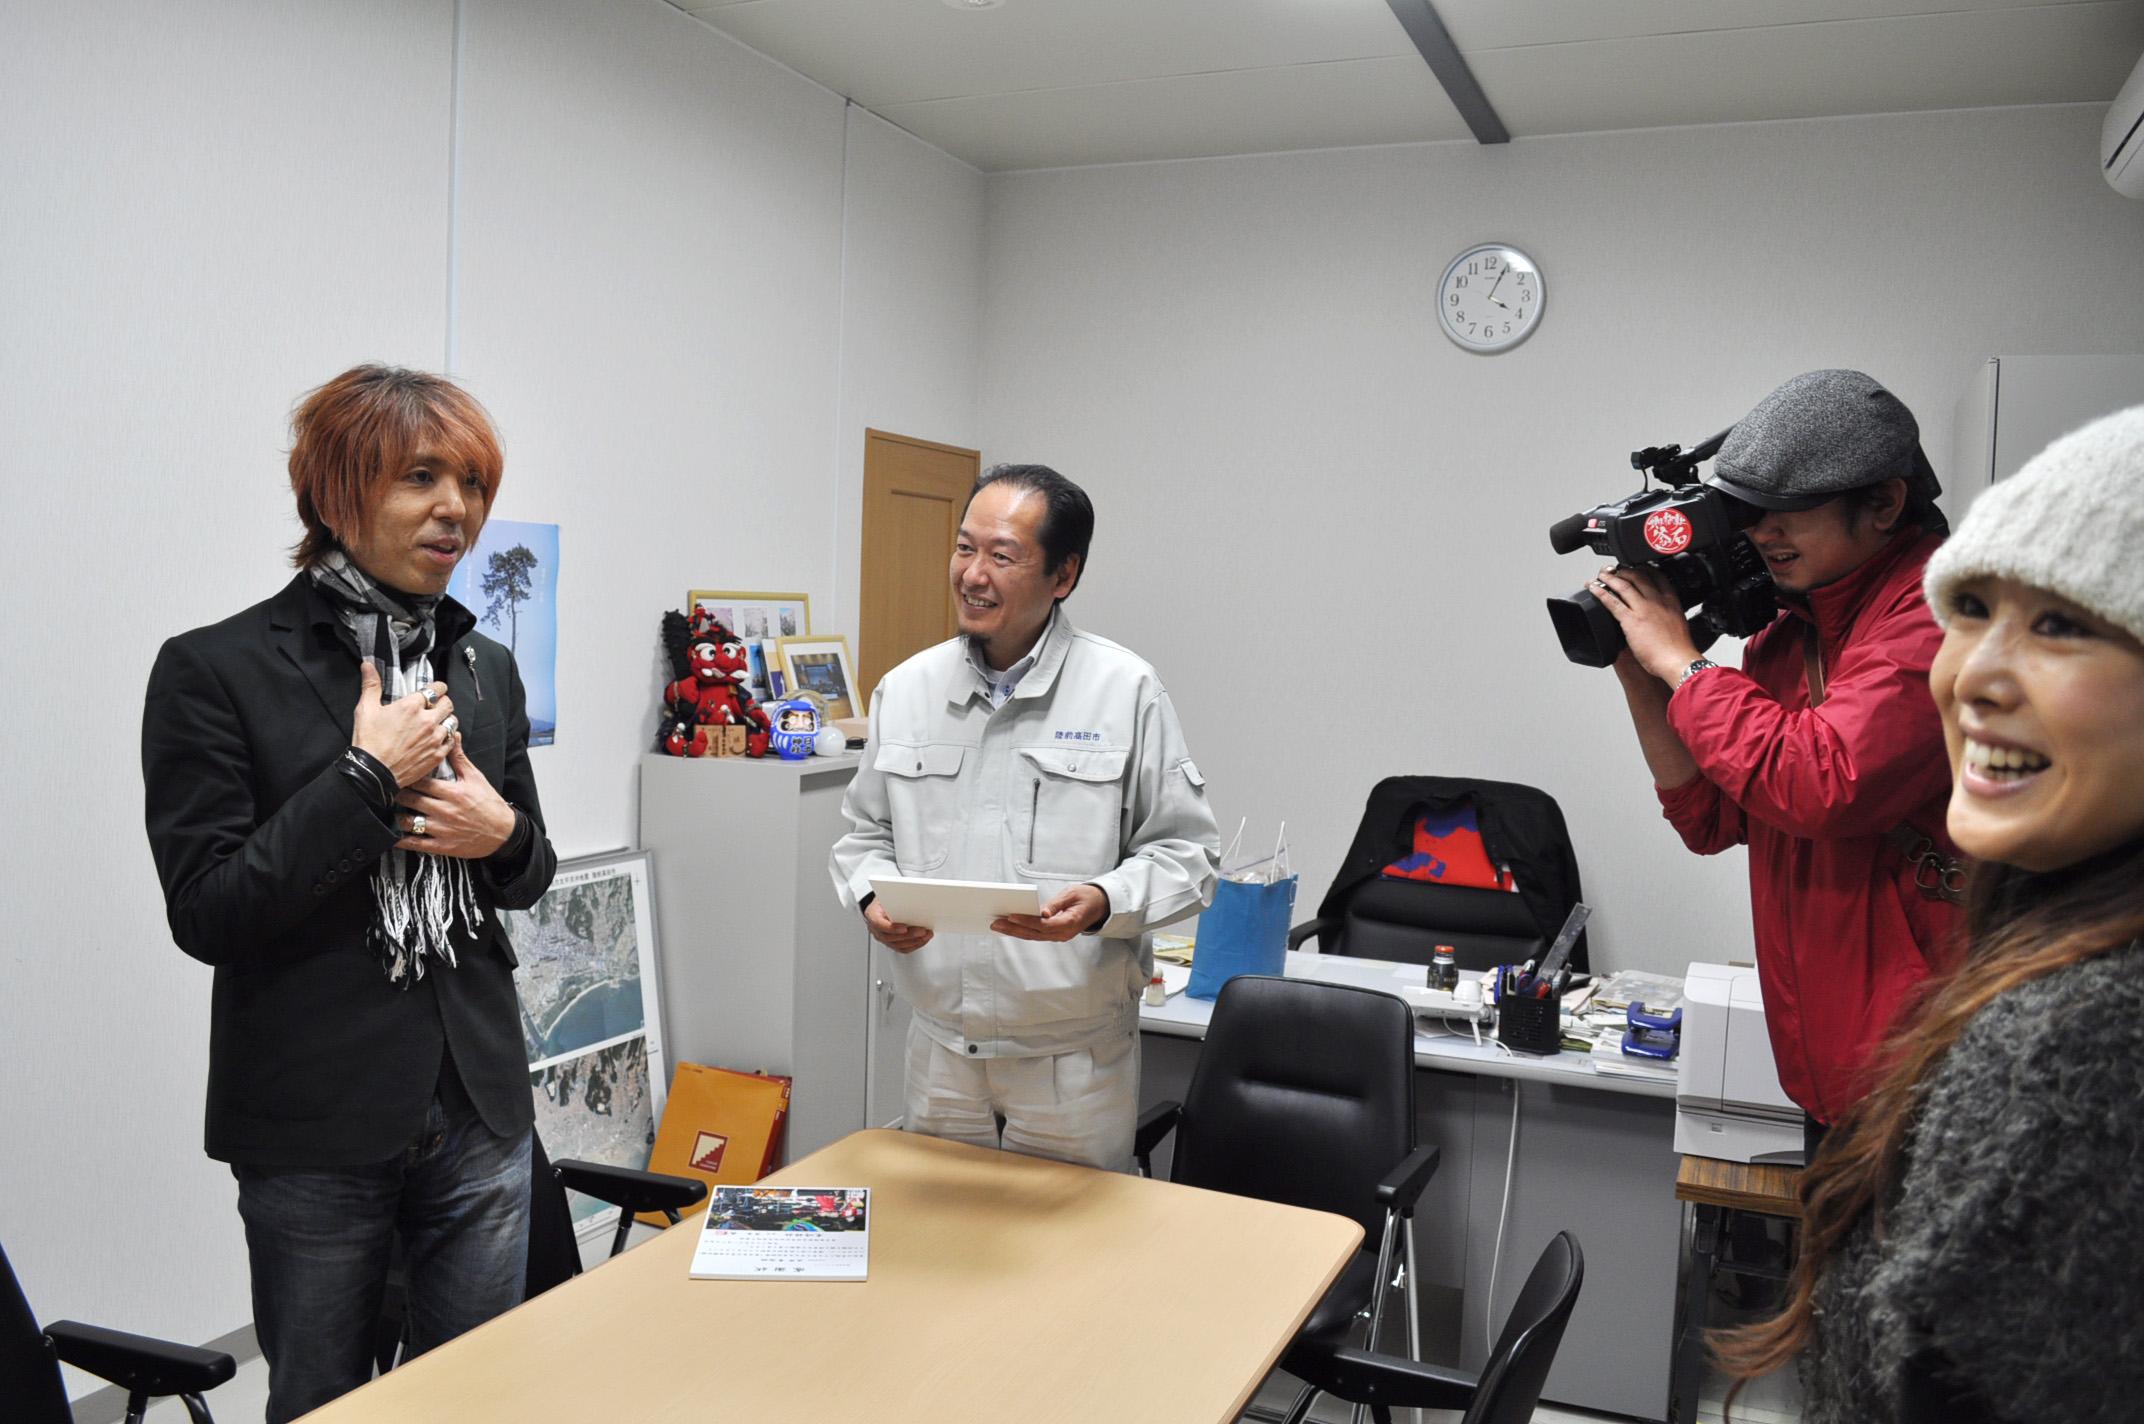 http://www.kickbackcafe.jp/support2/report/lll.JPG